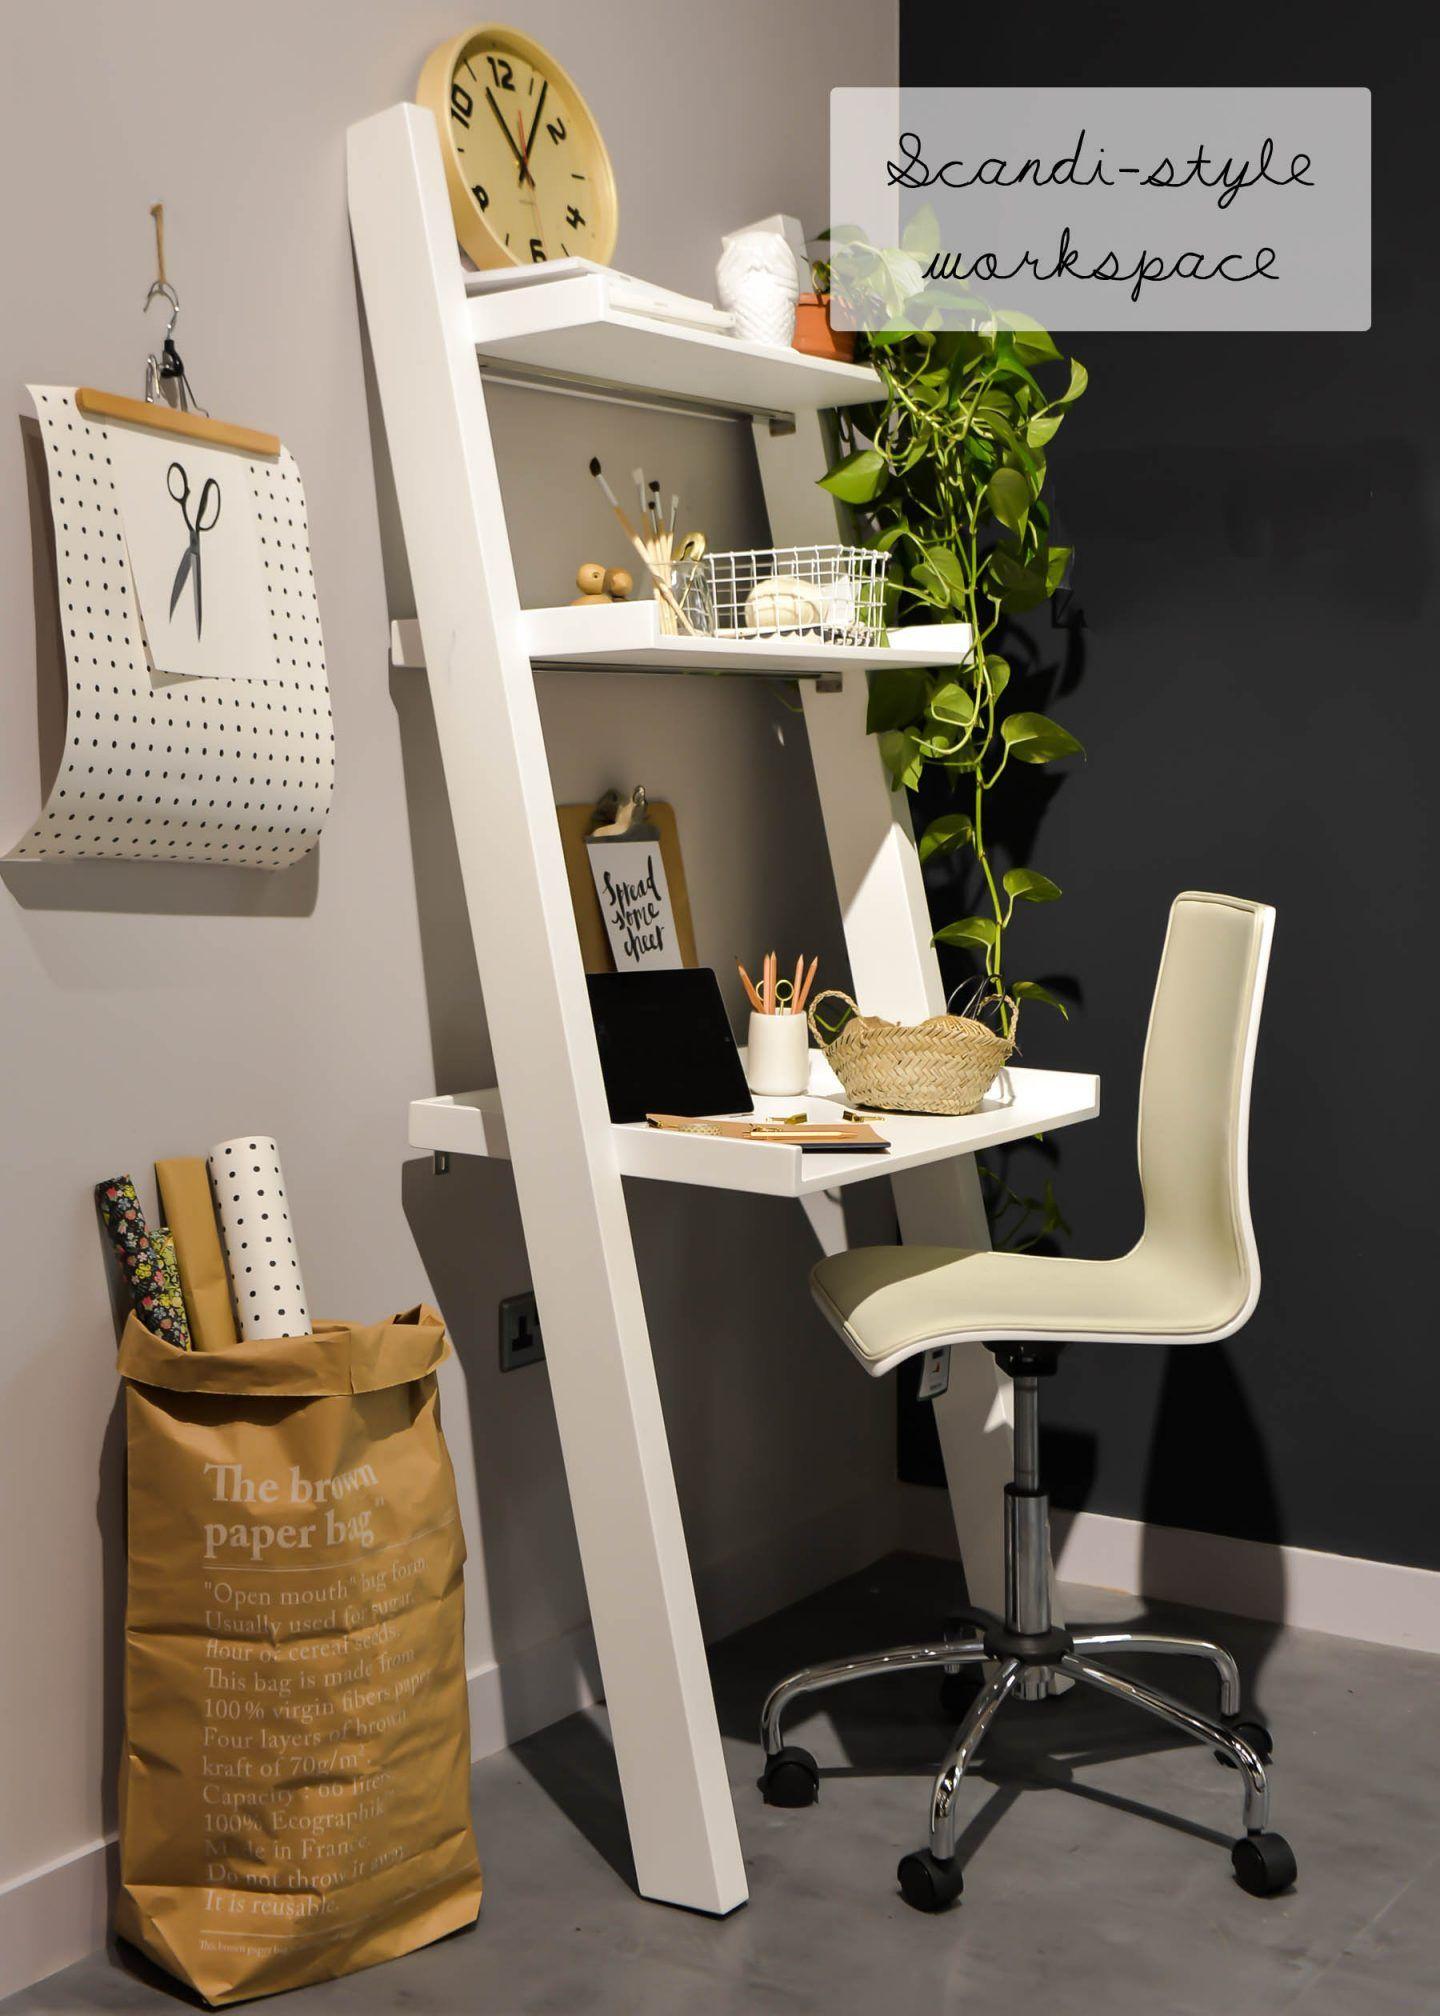 Styling at Dwell | Scandi workspace | Ladder desk ...